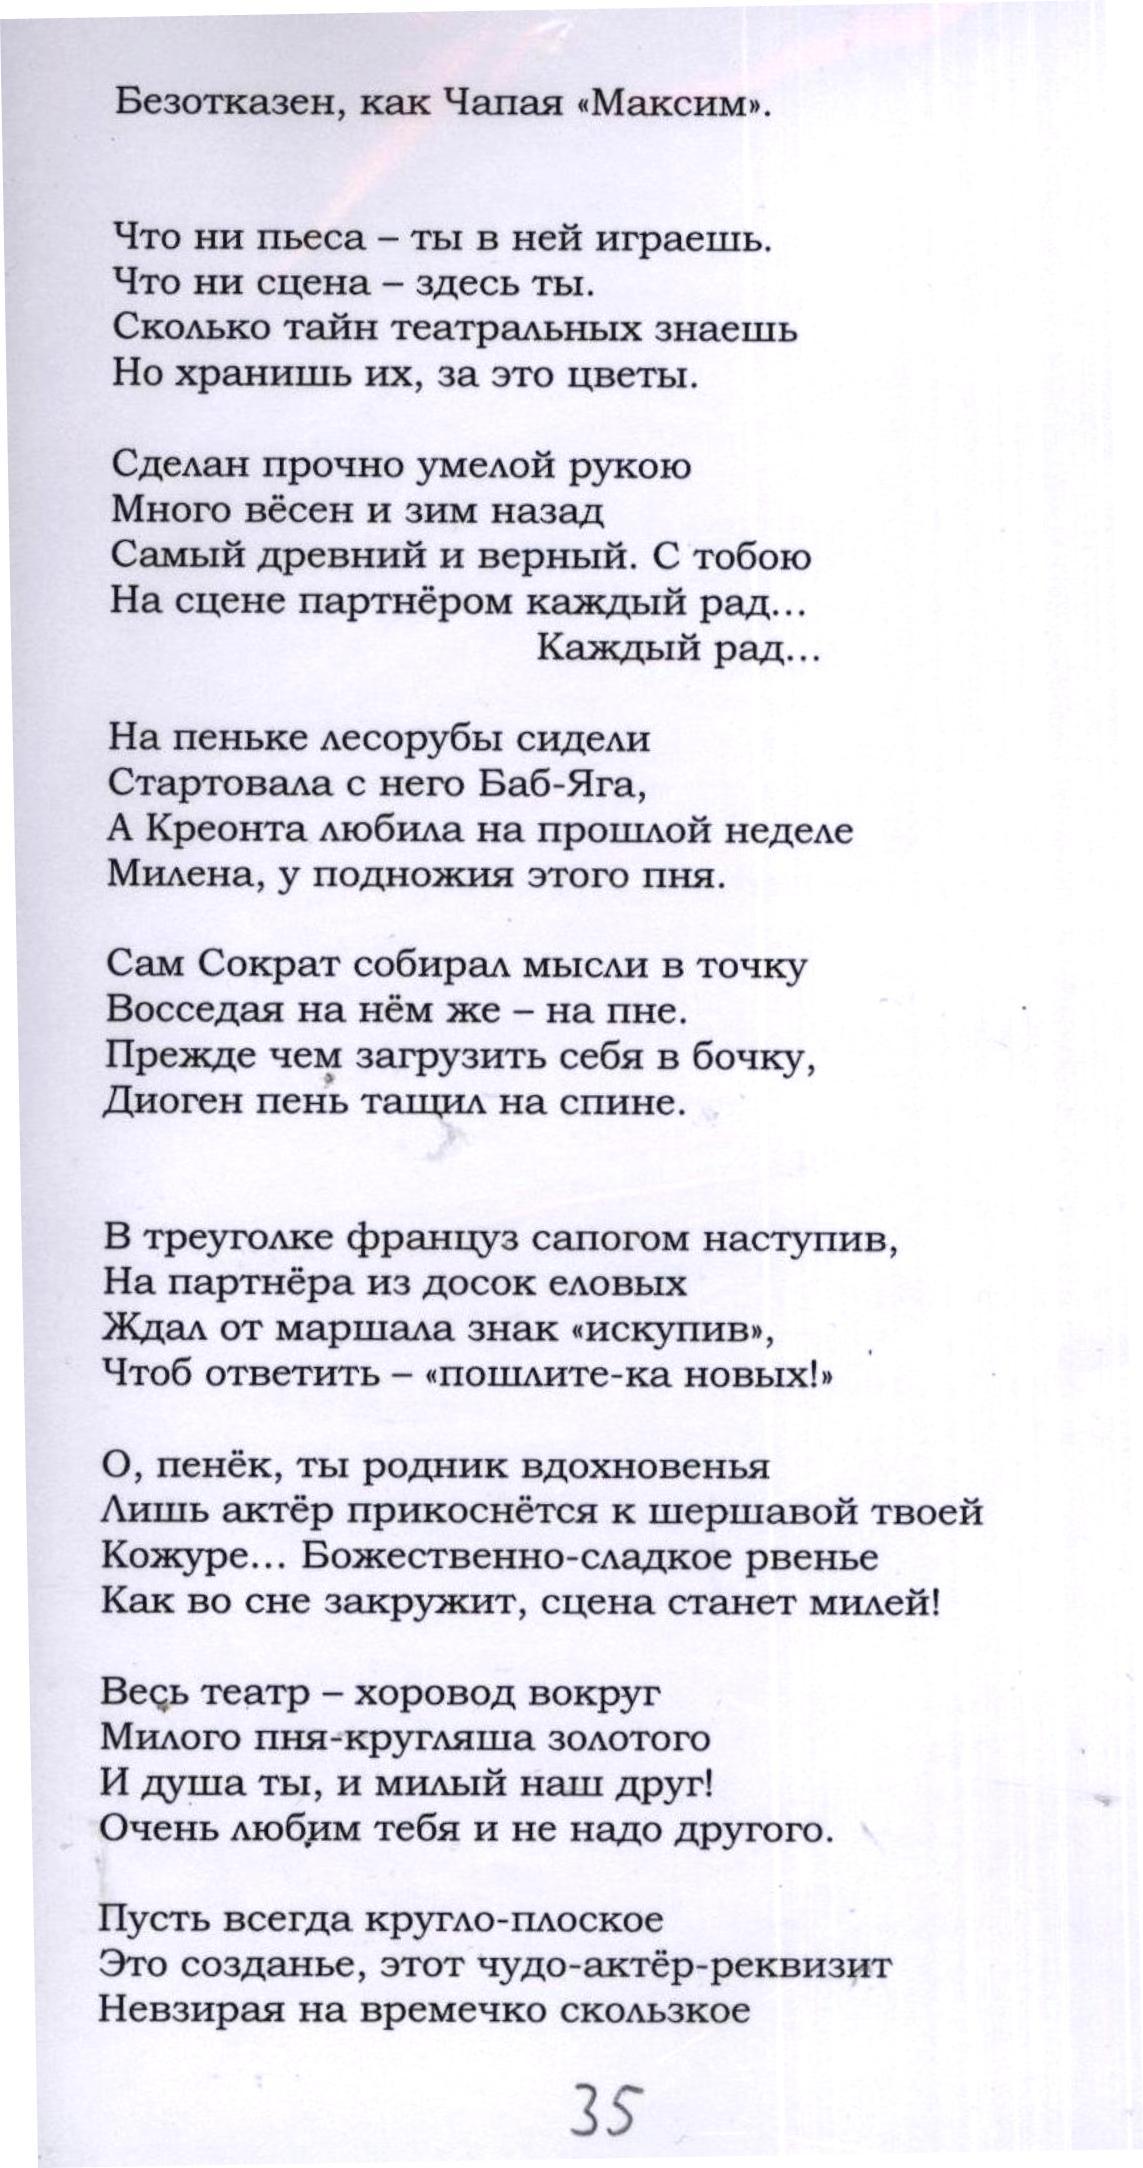 Стихи 034.jpg